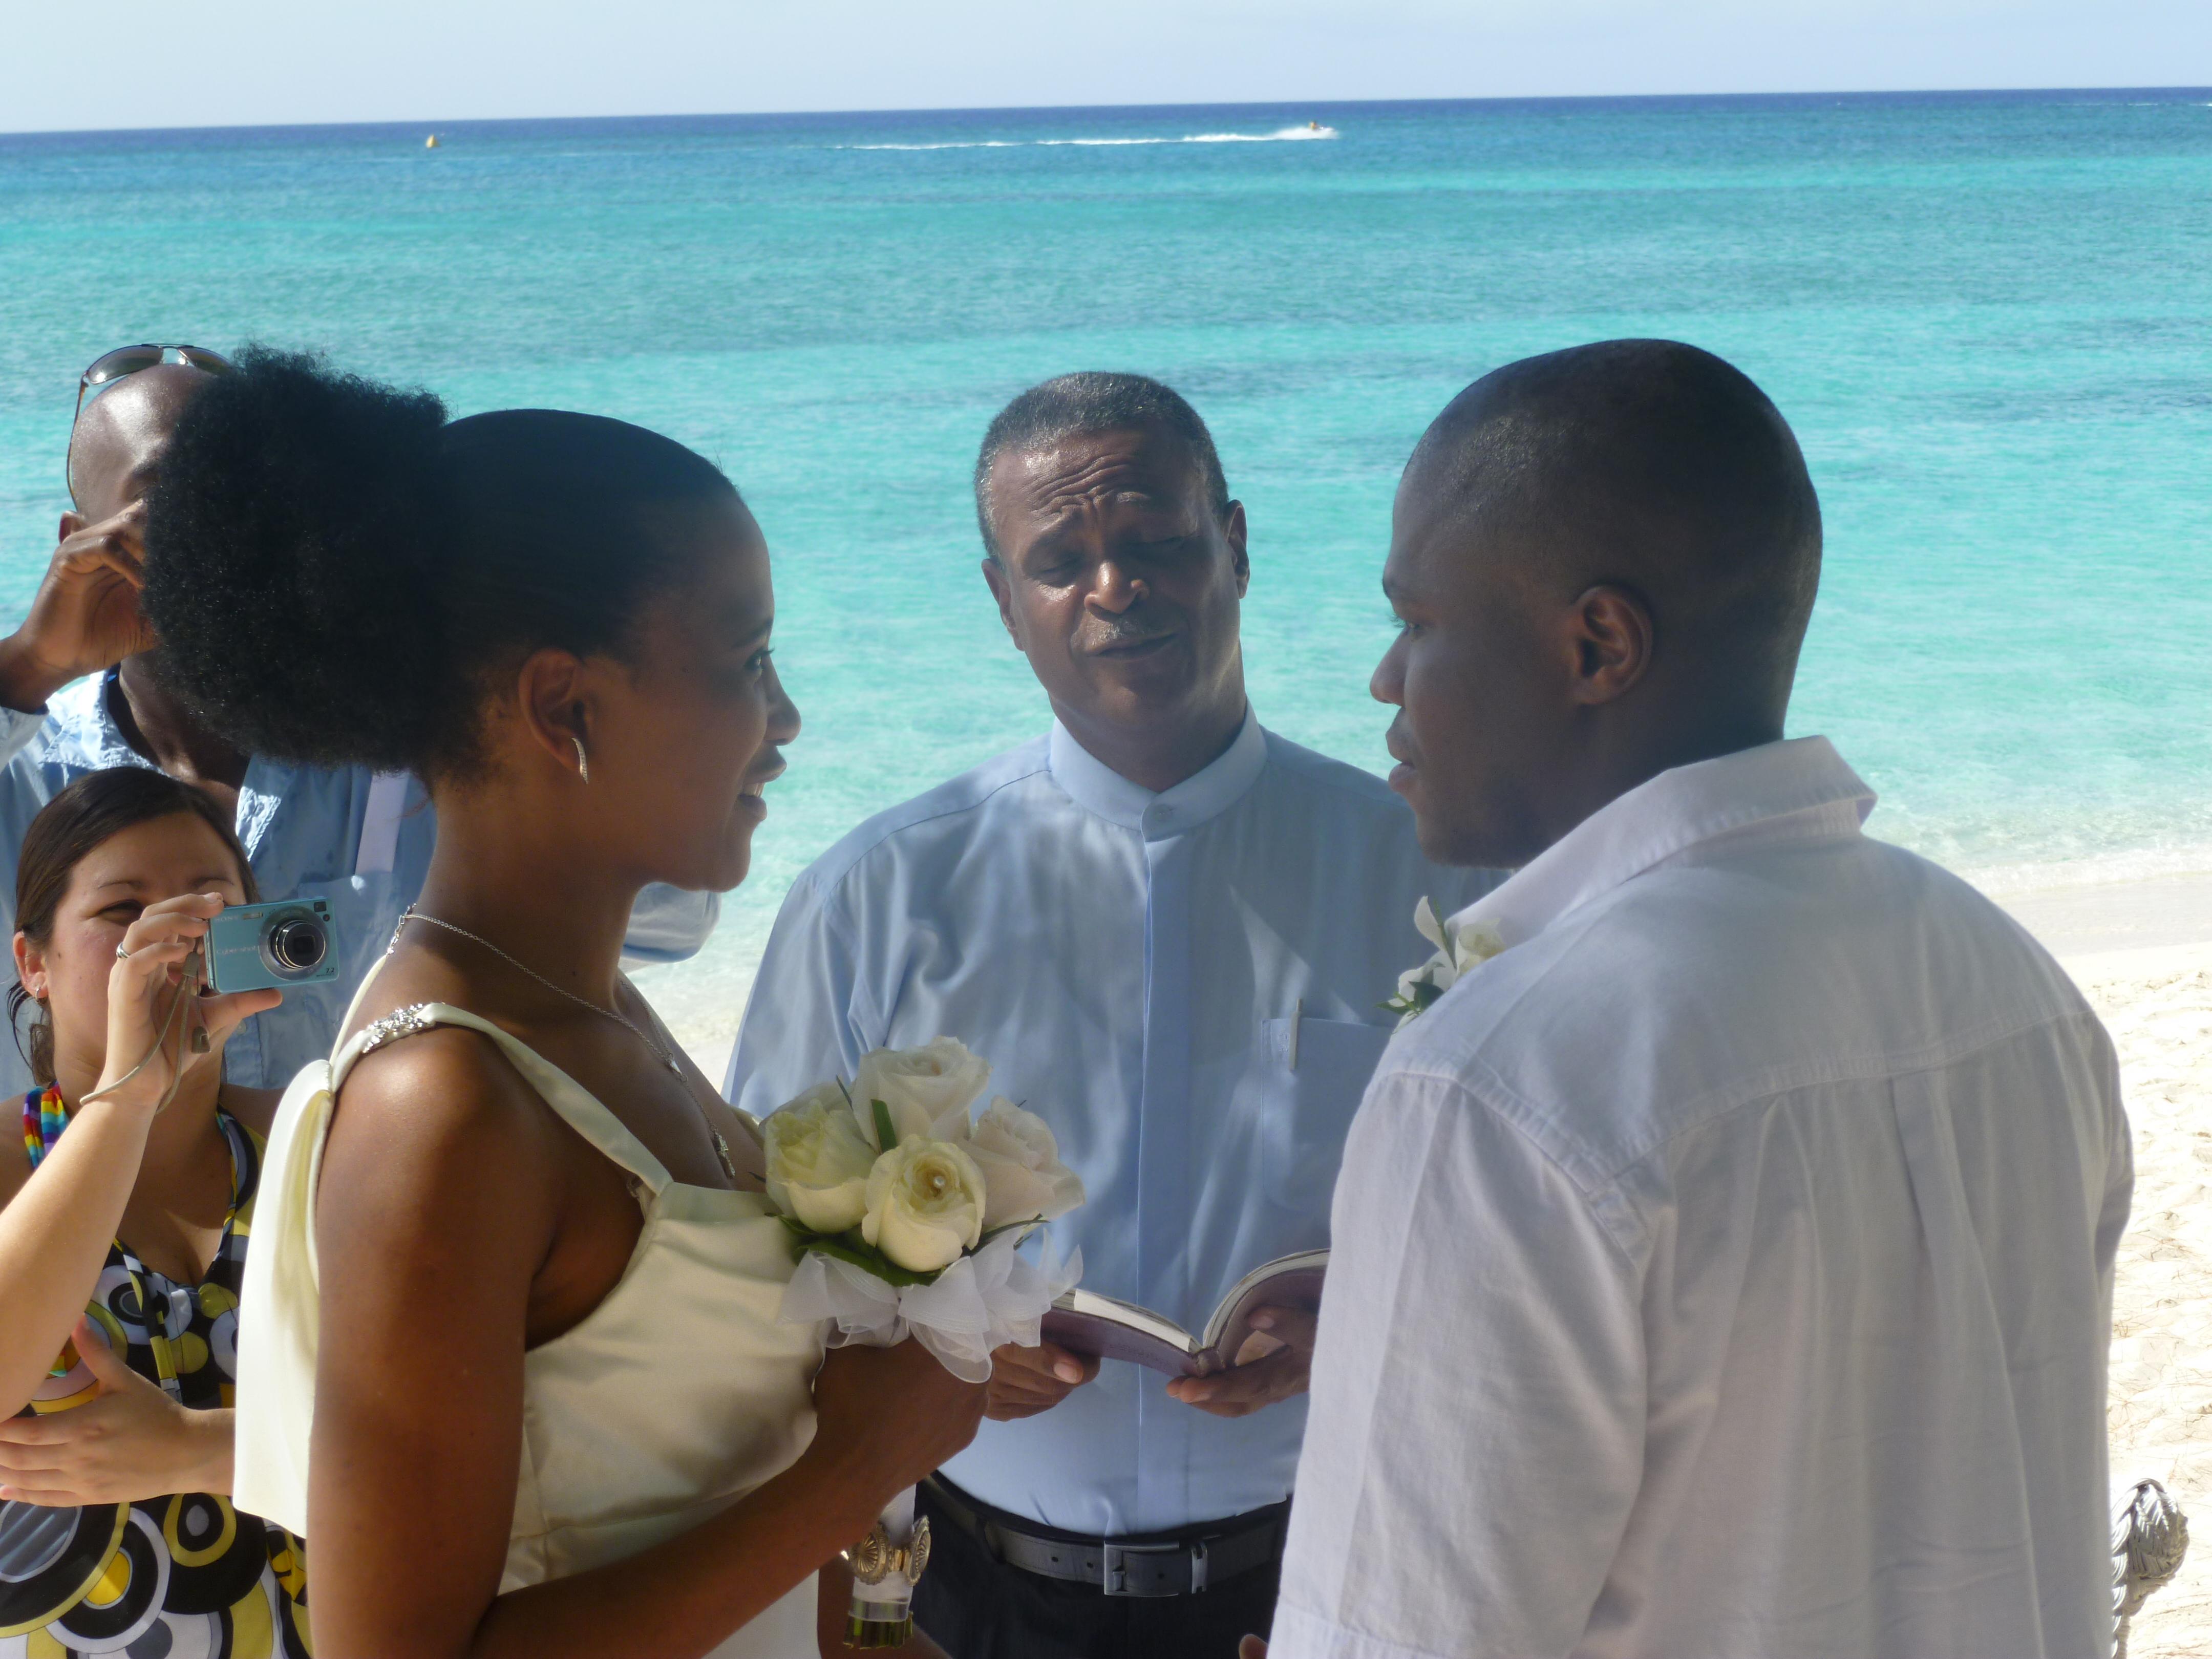 destination wedding offer avial blog On destination weddings travel group